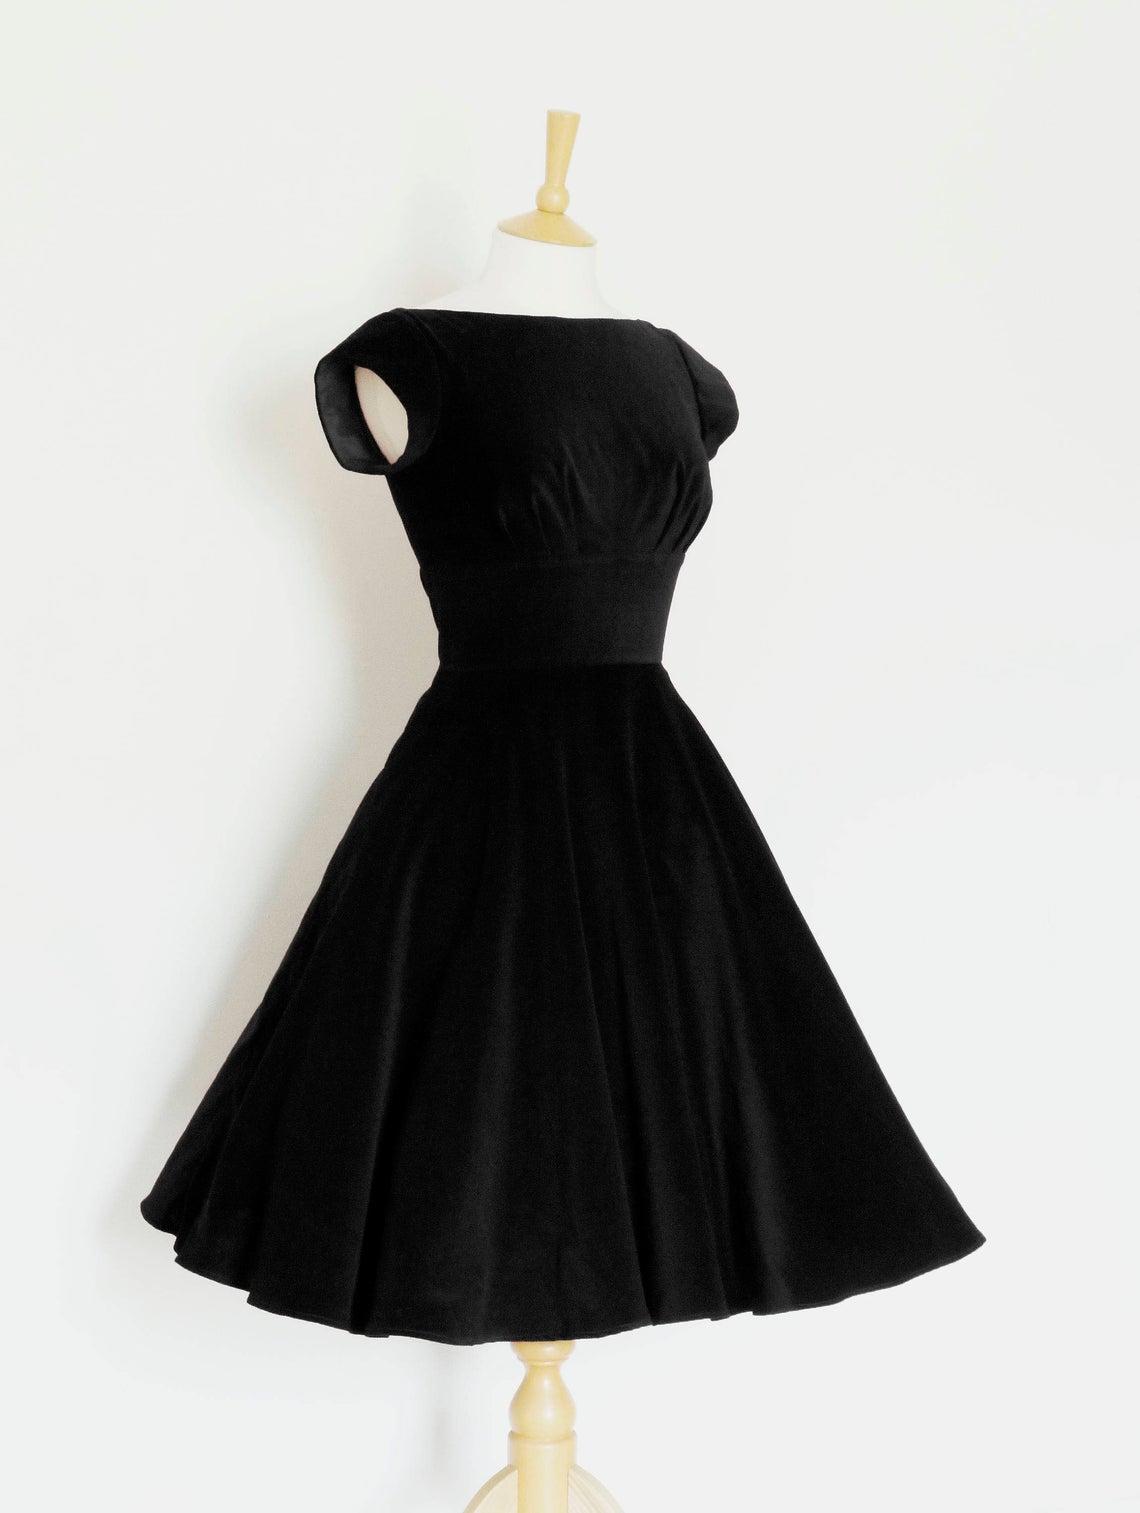 Size Uk 8 Black Velvet Tiffany Evening Dress